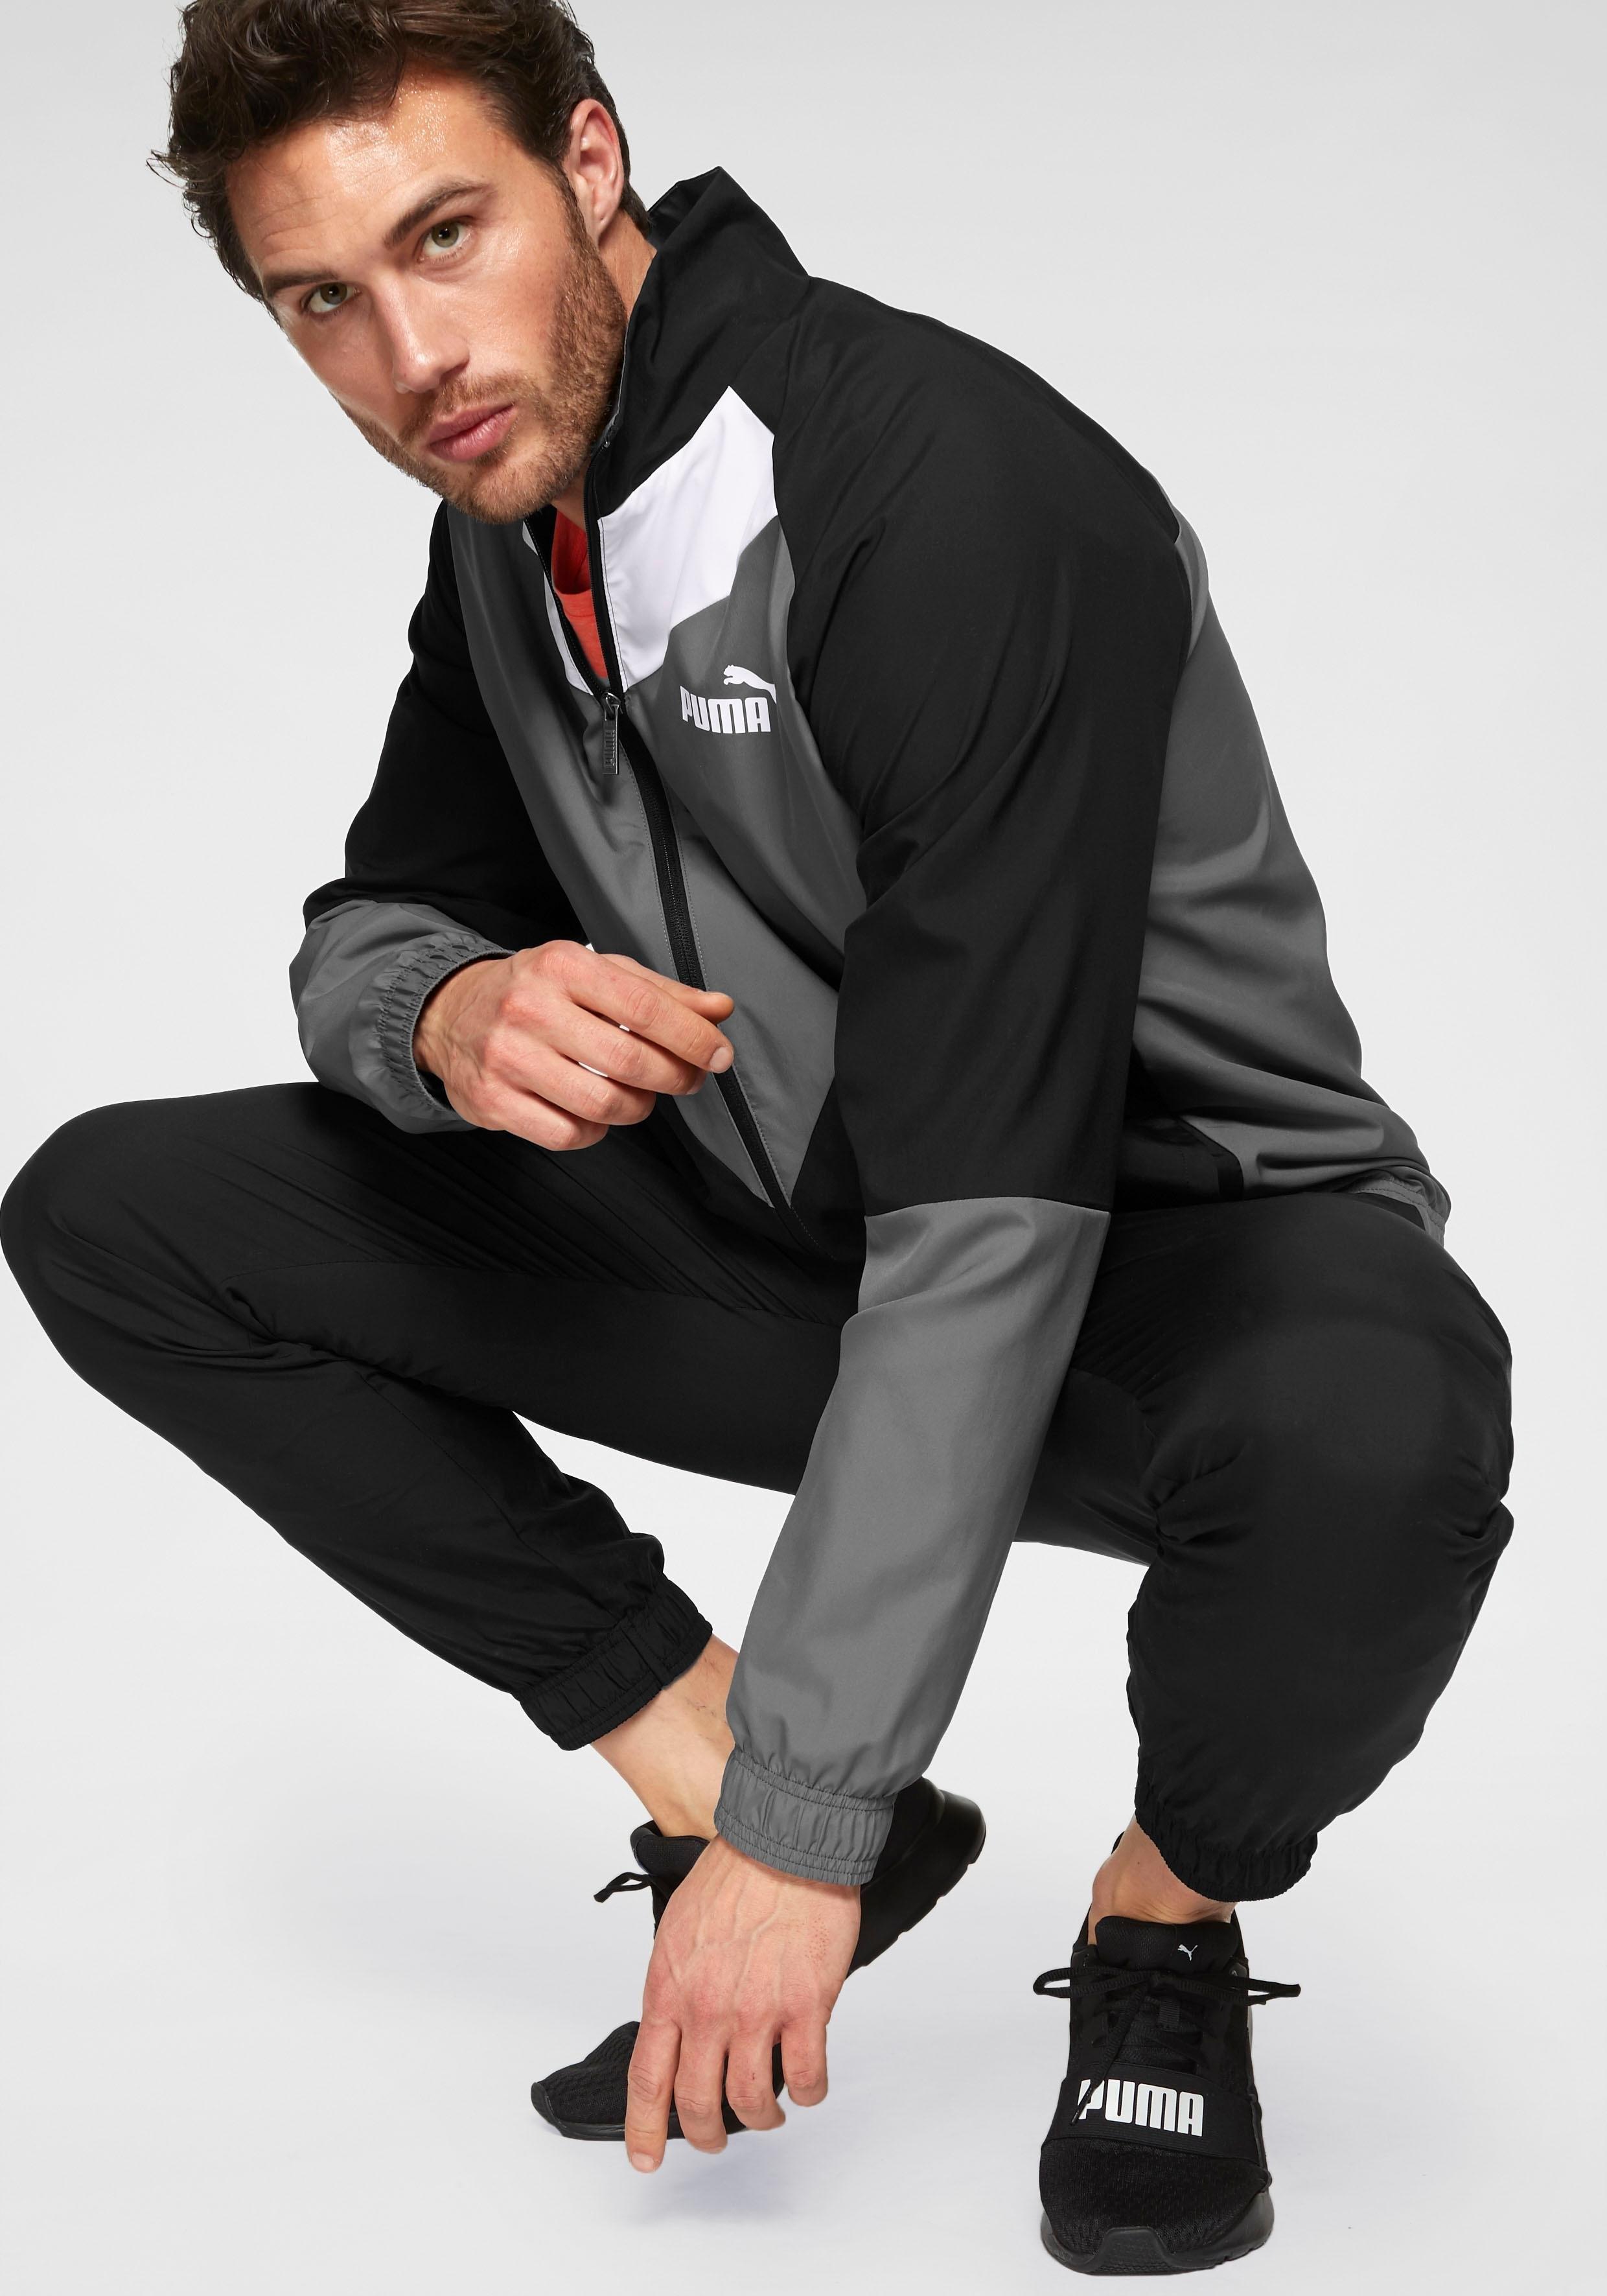 Puma sportpak (set, 2-delig) nu online bestellen